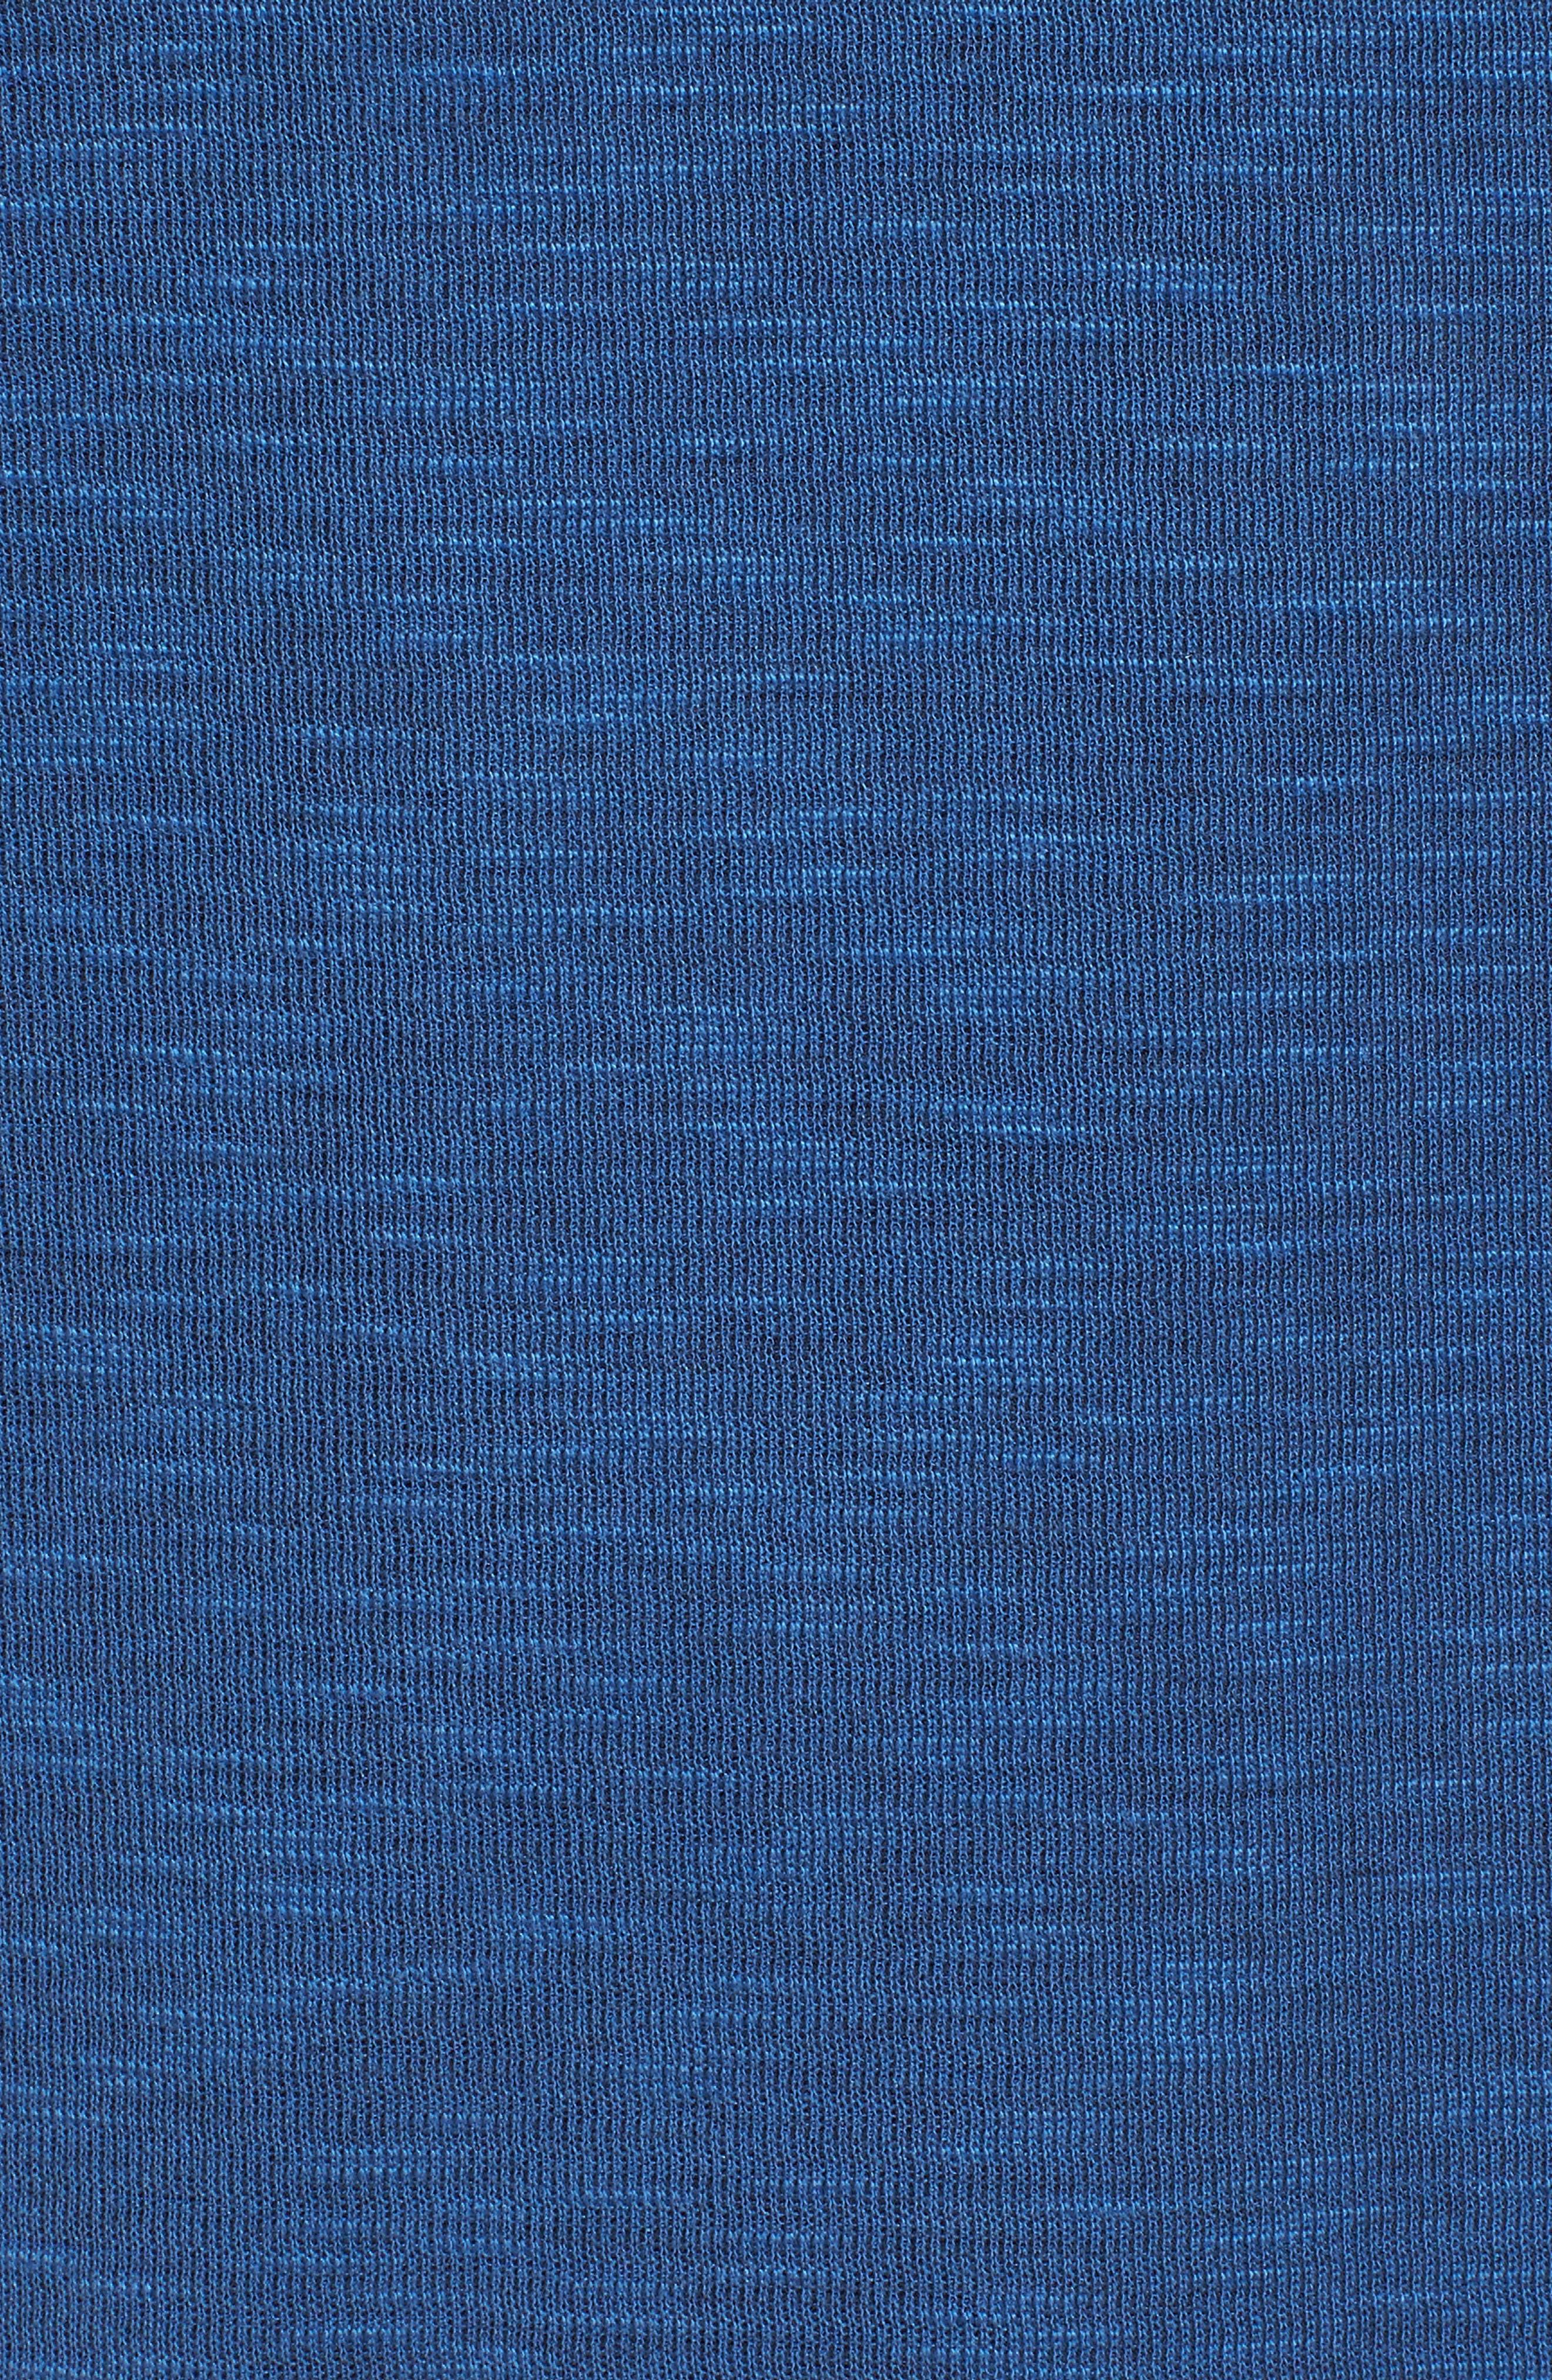 Flip Tide Standard Fit T-Shirt,                             Alternate thumbnail 6, color,                             GALAXY BLUE